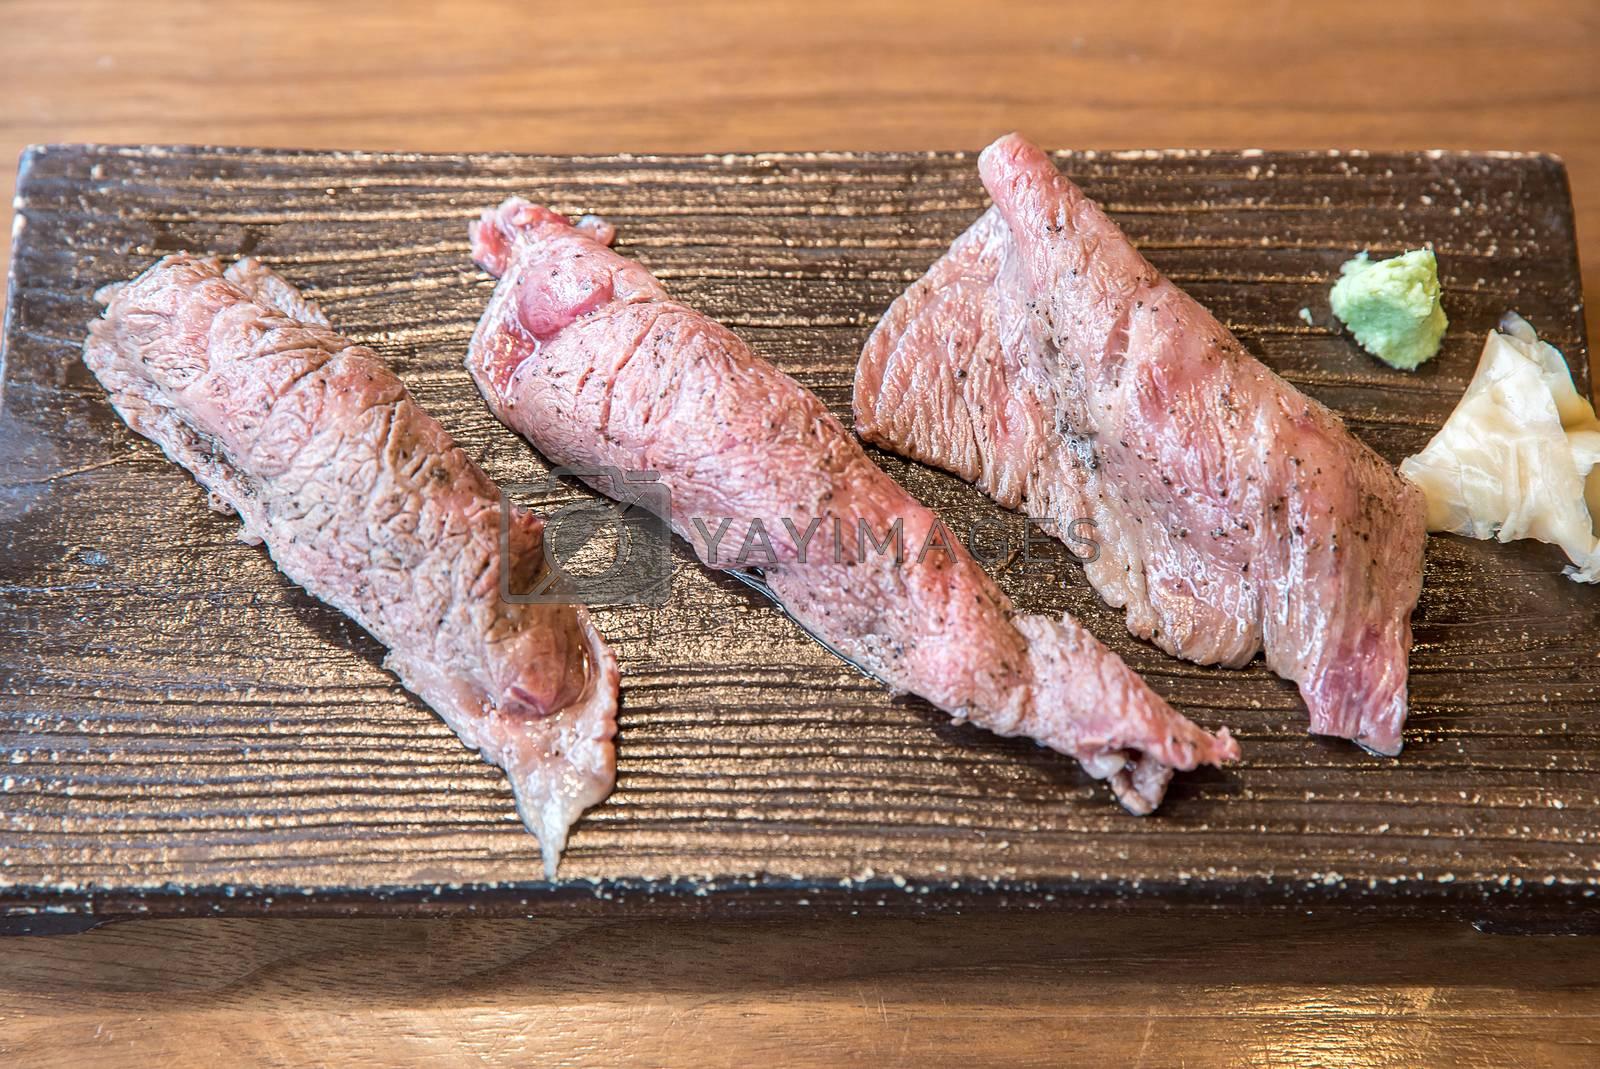 Sushi hida A5 wagyu beef, groumet japanese cuisine